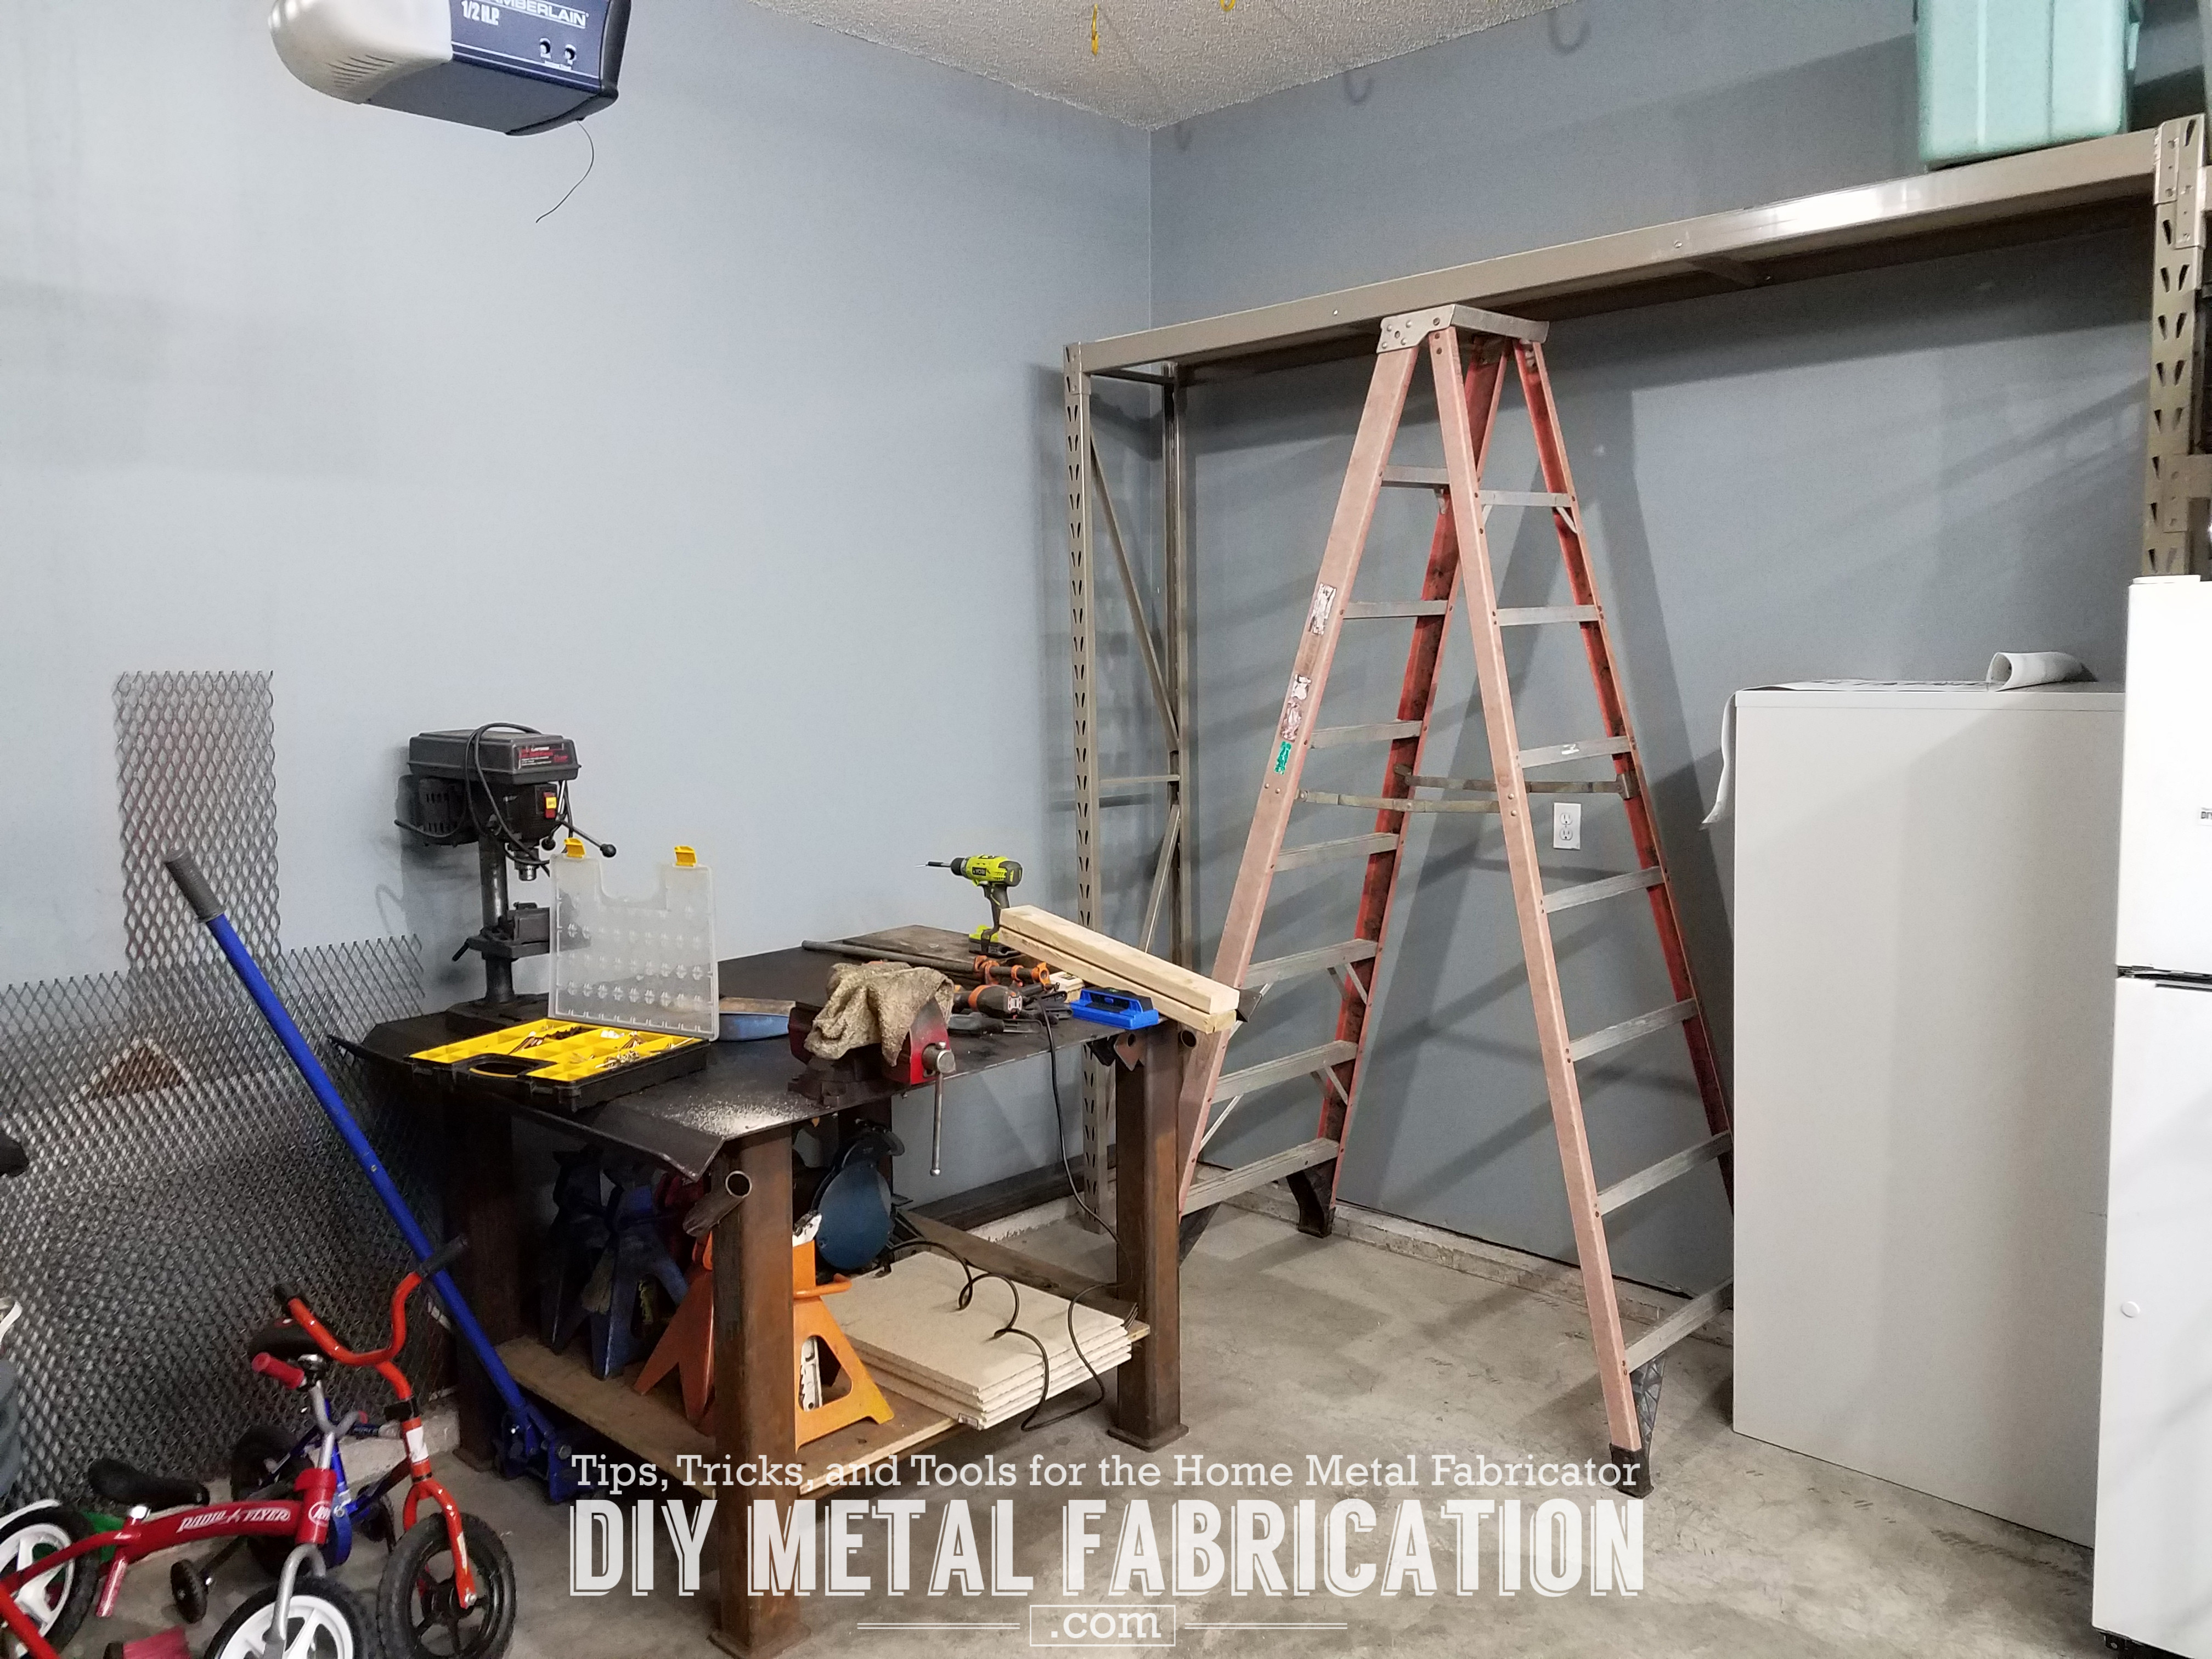 diy how to install garage air hose reel diy metal fabrication com. Black Bedroom Furniture Sets. Home Design Ideas